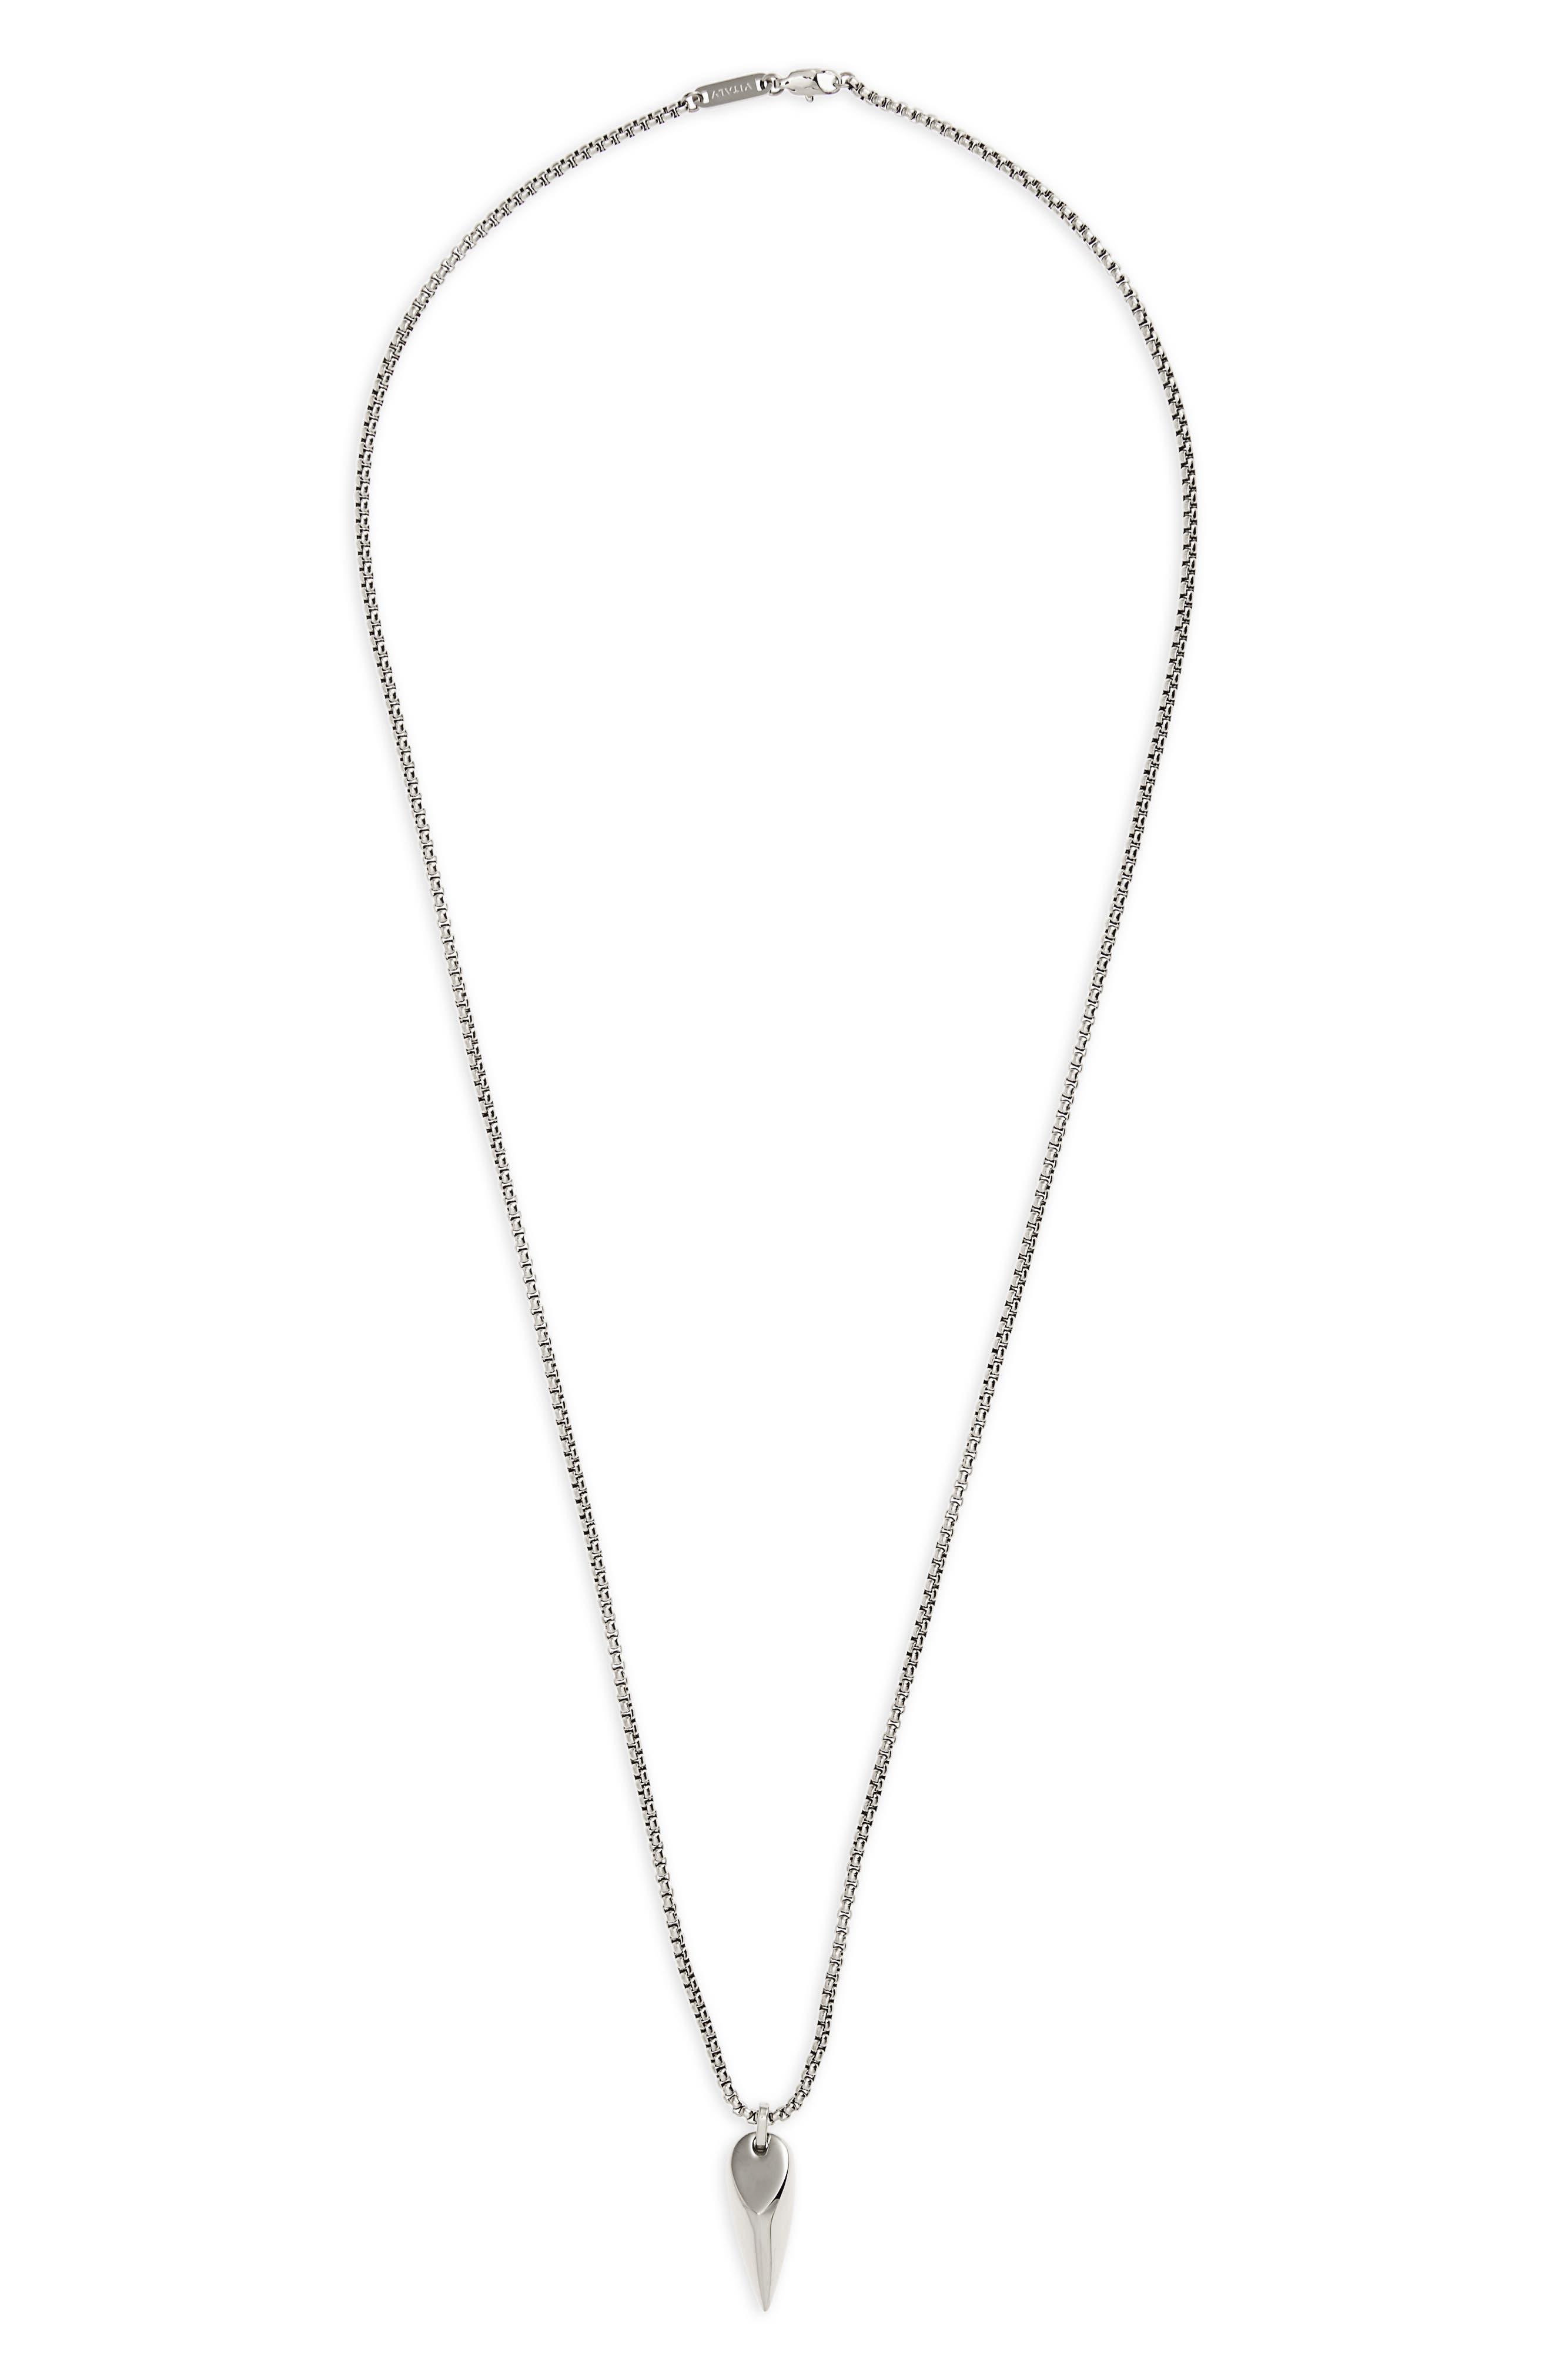 Alternate Image 1 Selected - Vitaly Corvus Pendant Necklace